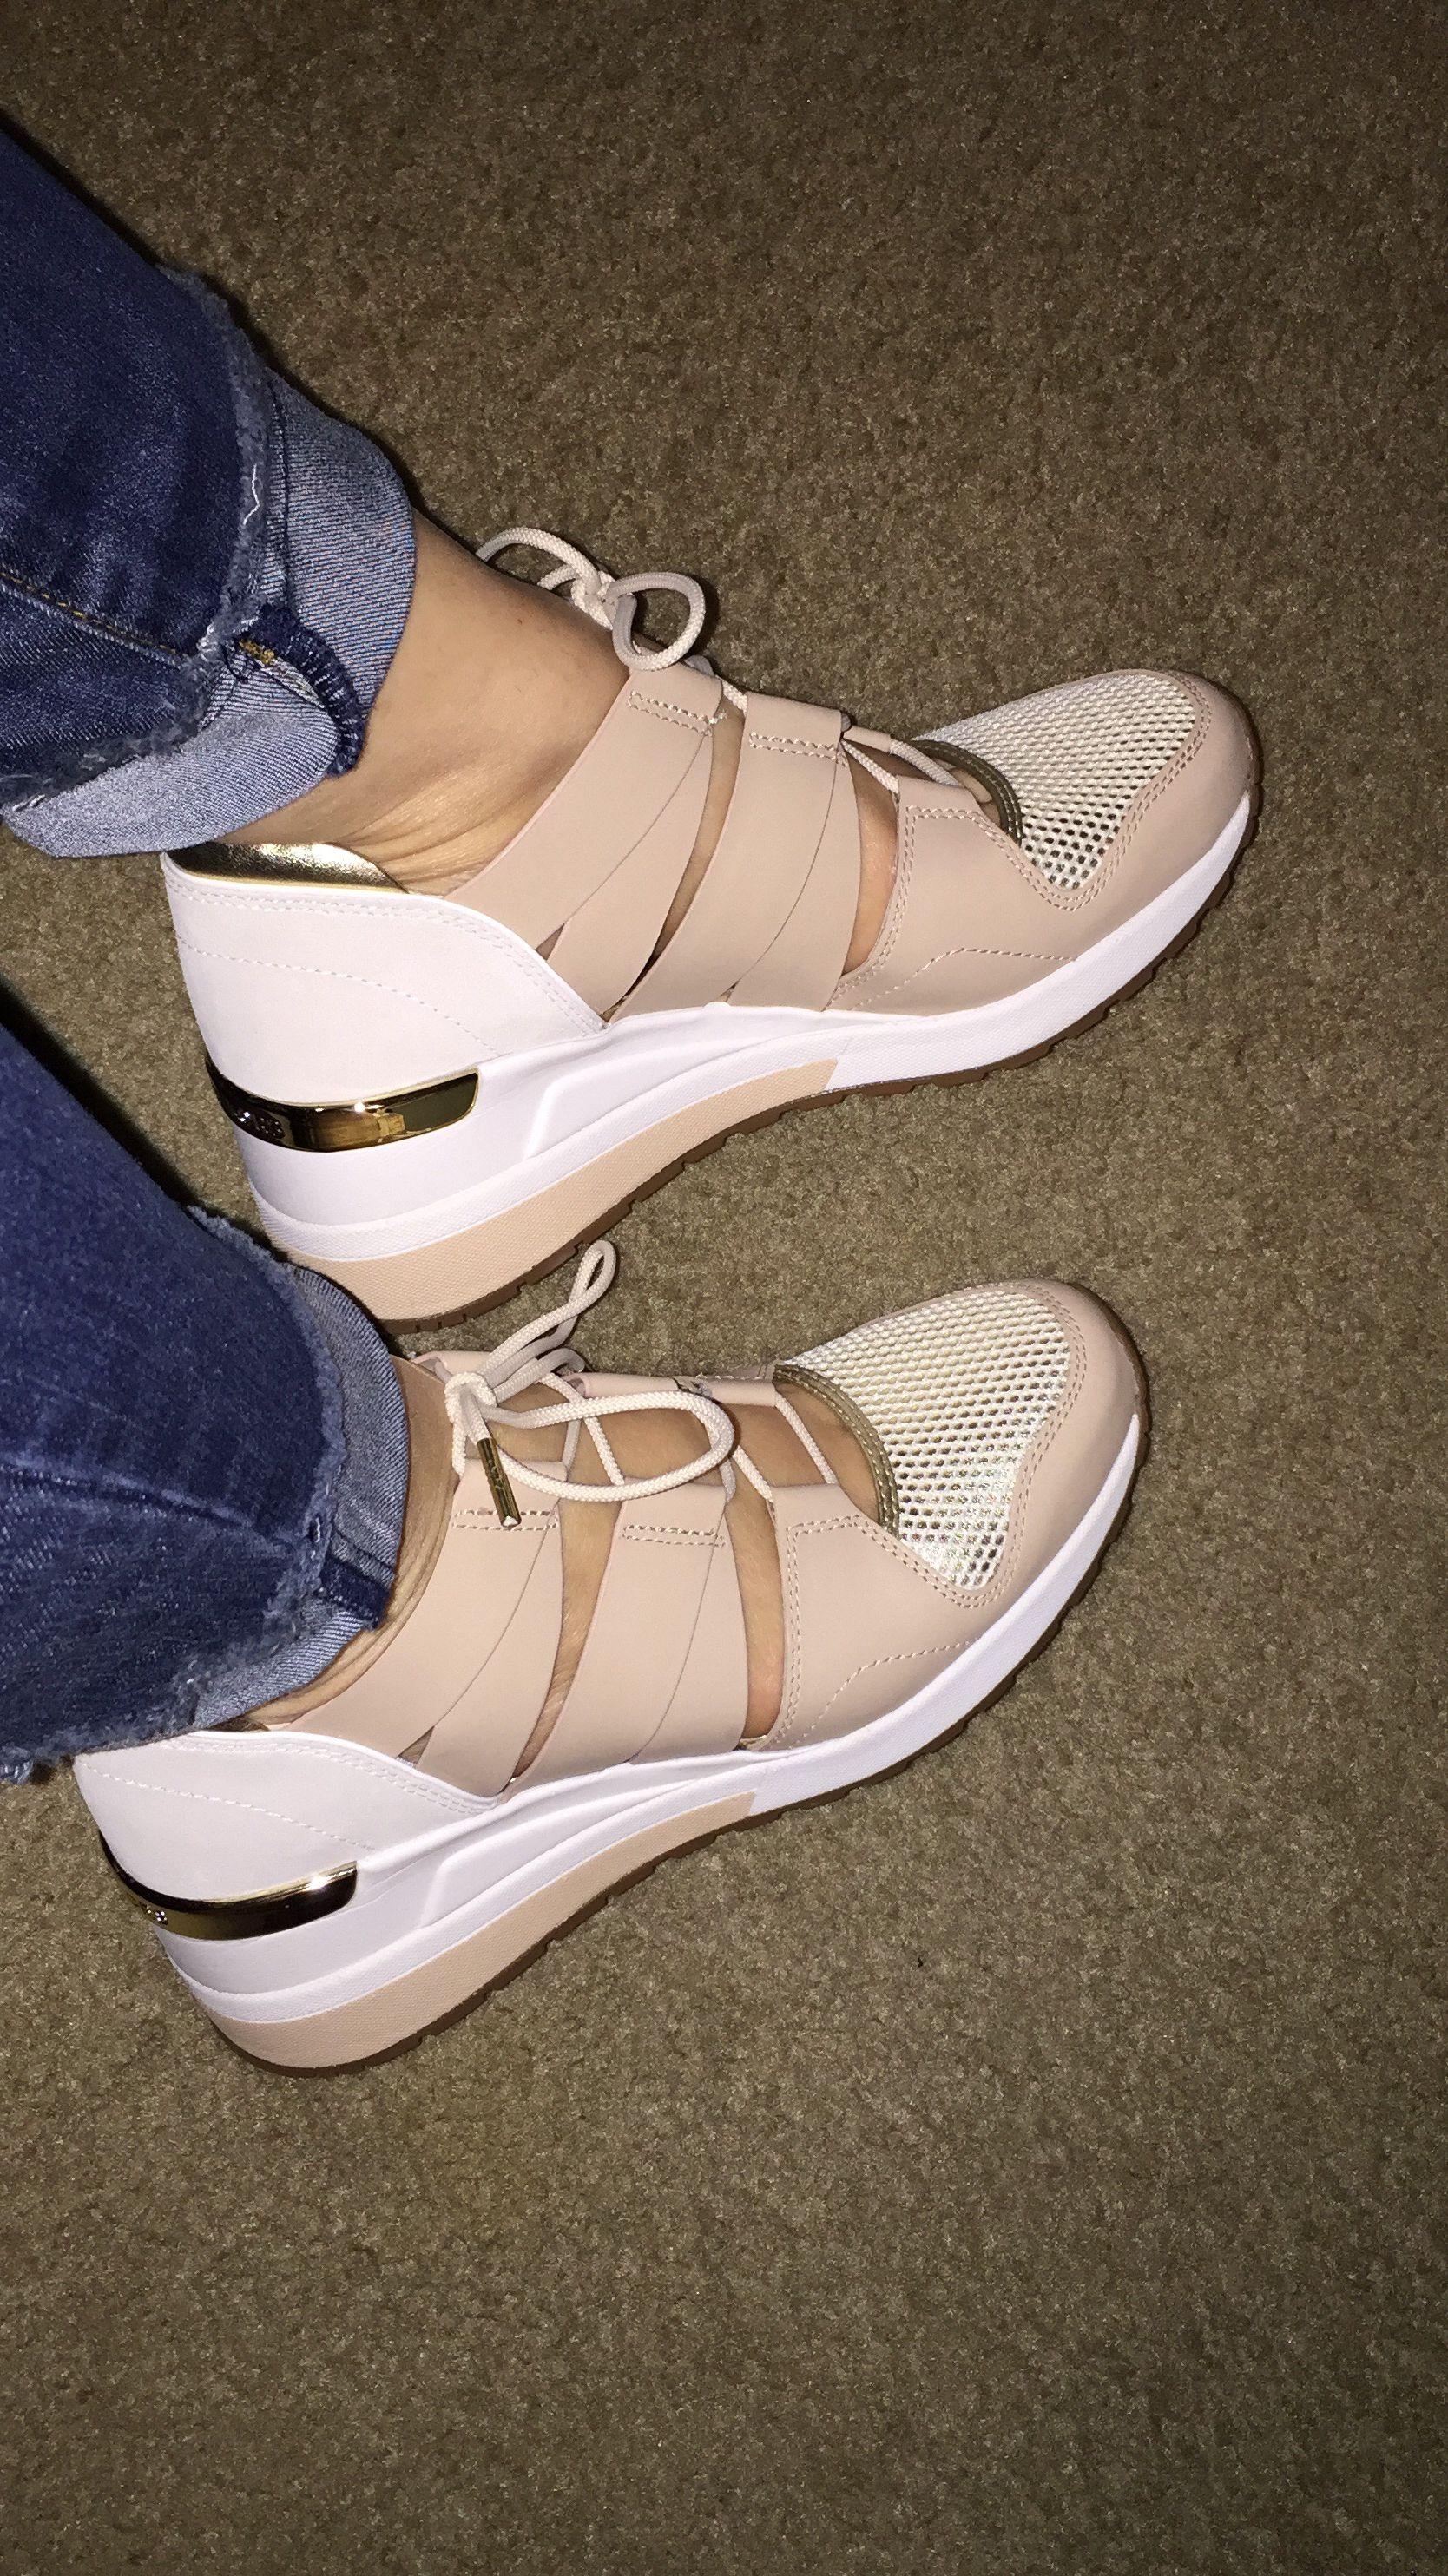 10+ Michael kors girls shoes ideas ideas in 2021